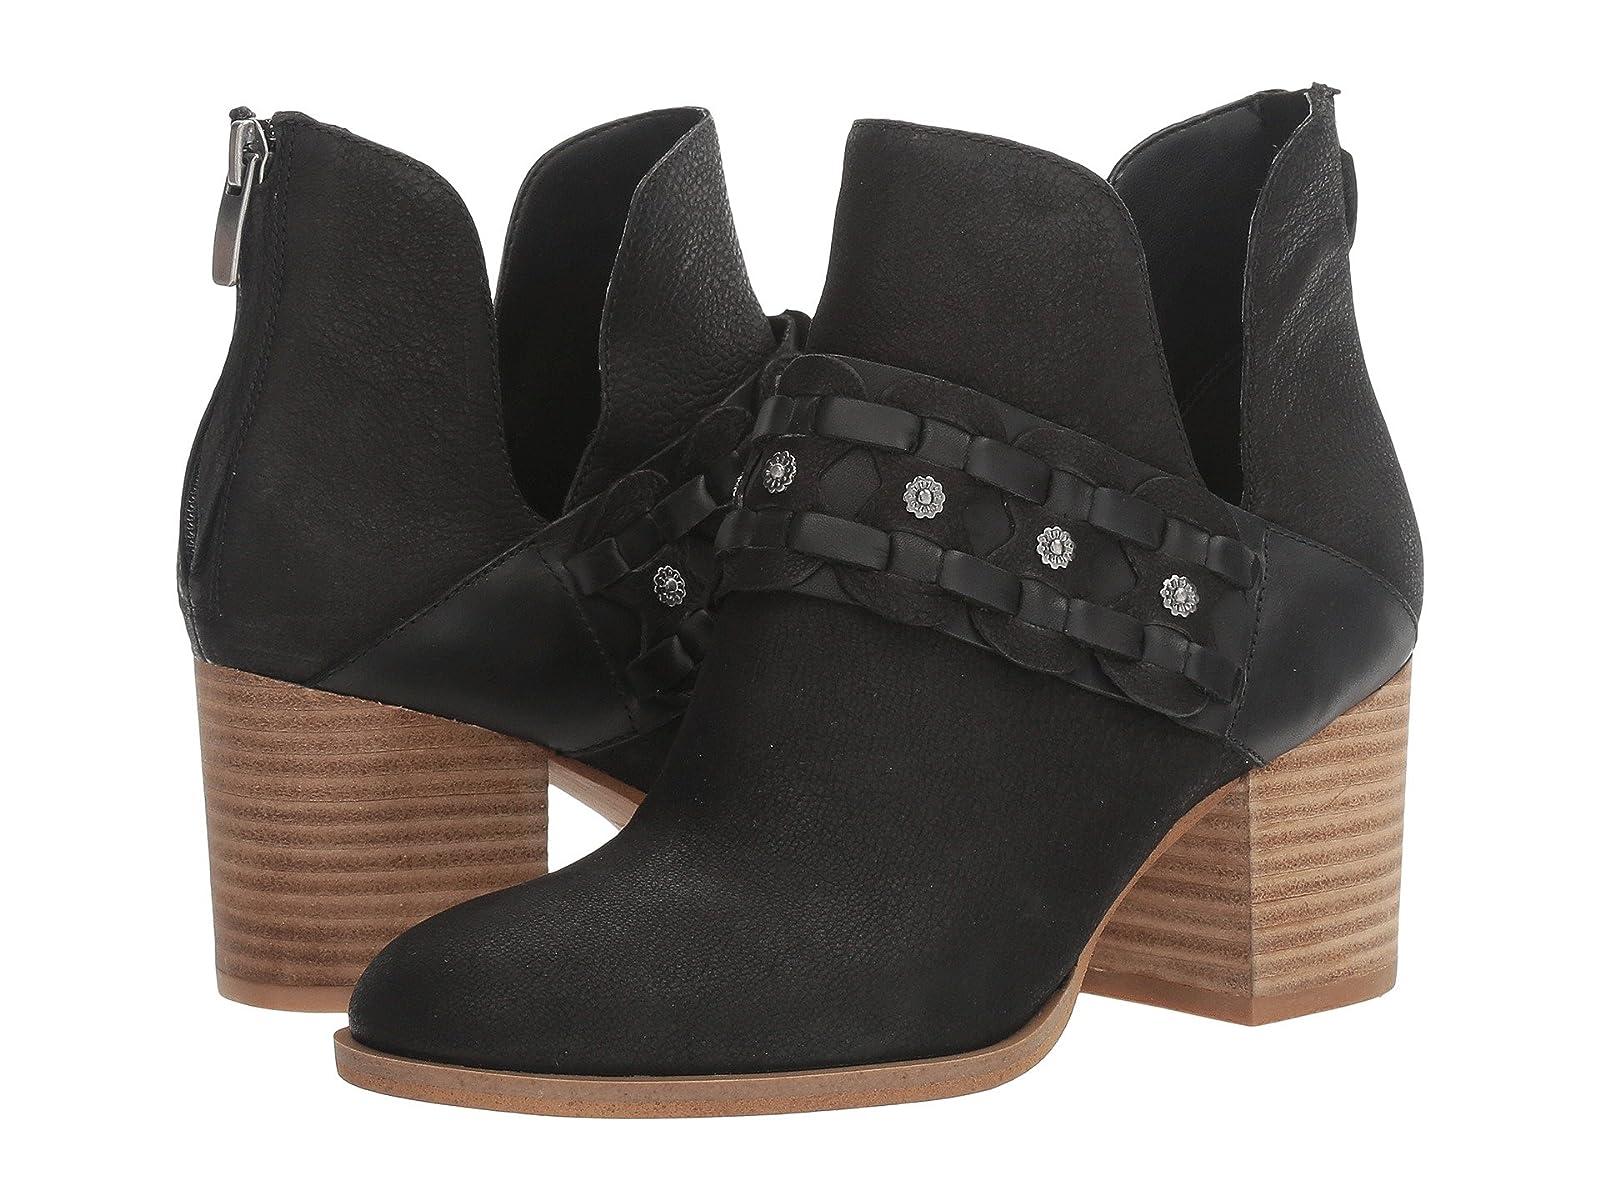 Nine West DanbiaCheap and distinctive eye-catching shoes